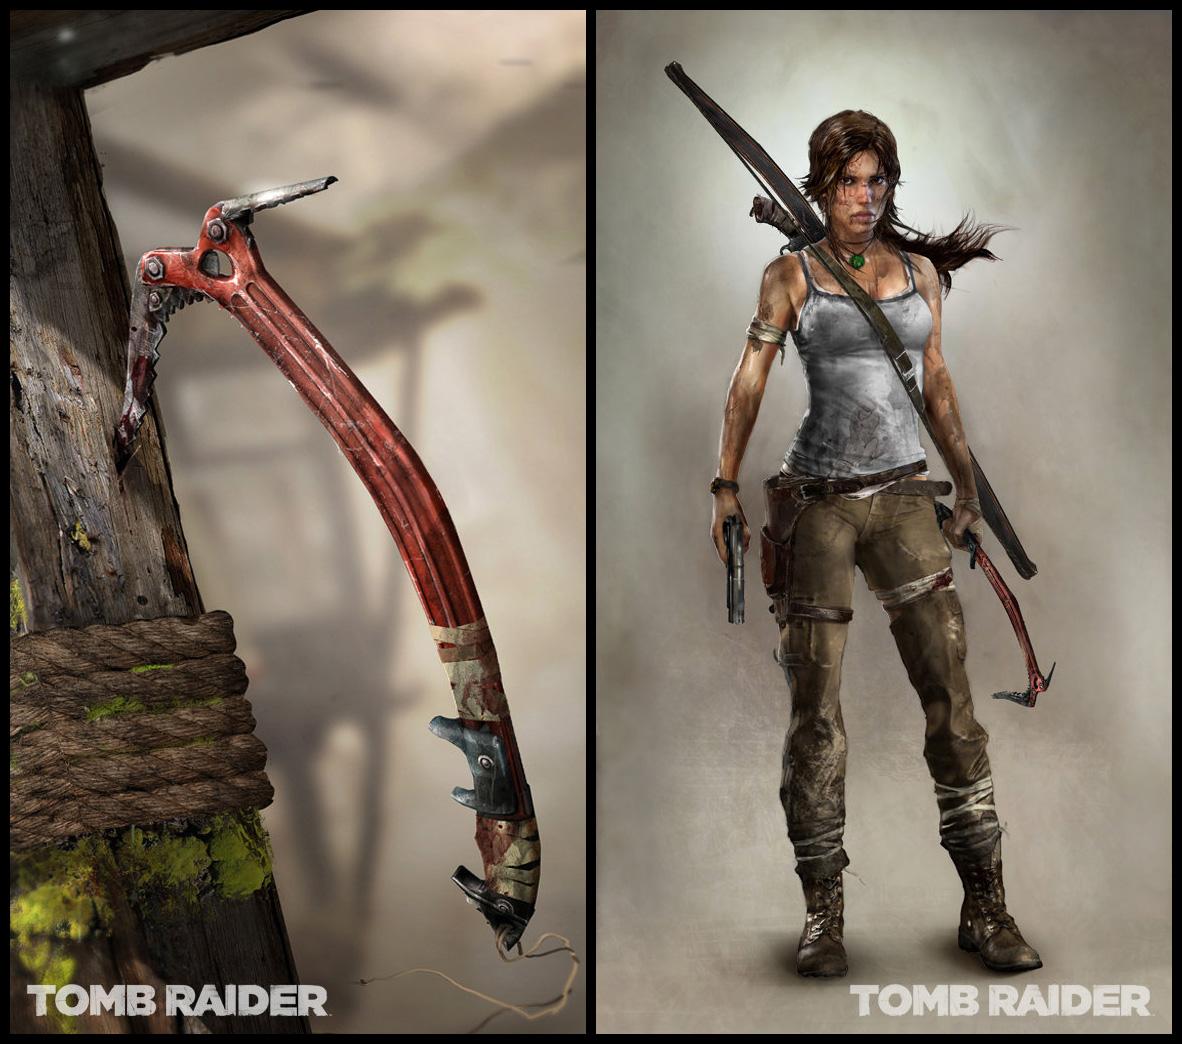 Wallpaper Shadow Of The Tomb Raider Lara Croft Concept: Tomb Raider Concept Art And Art Book